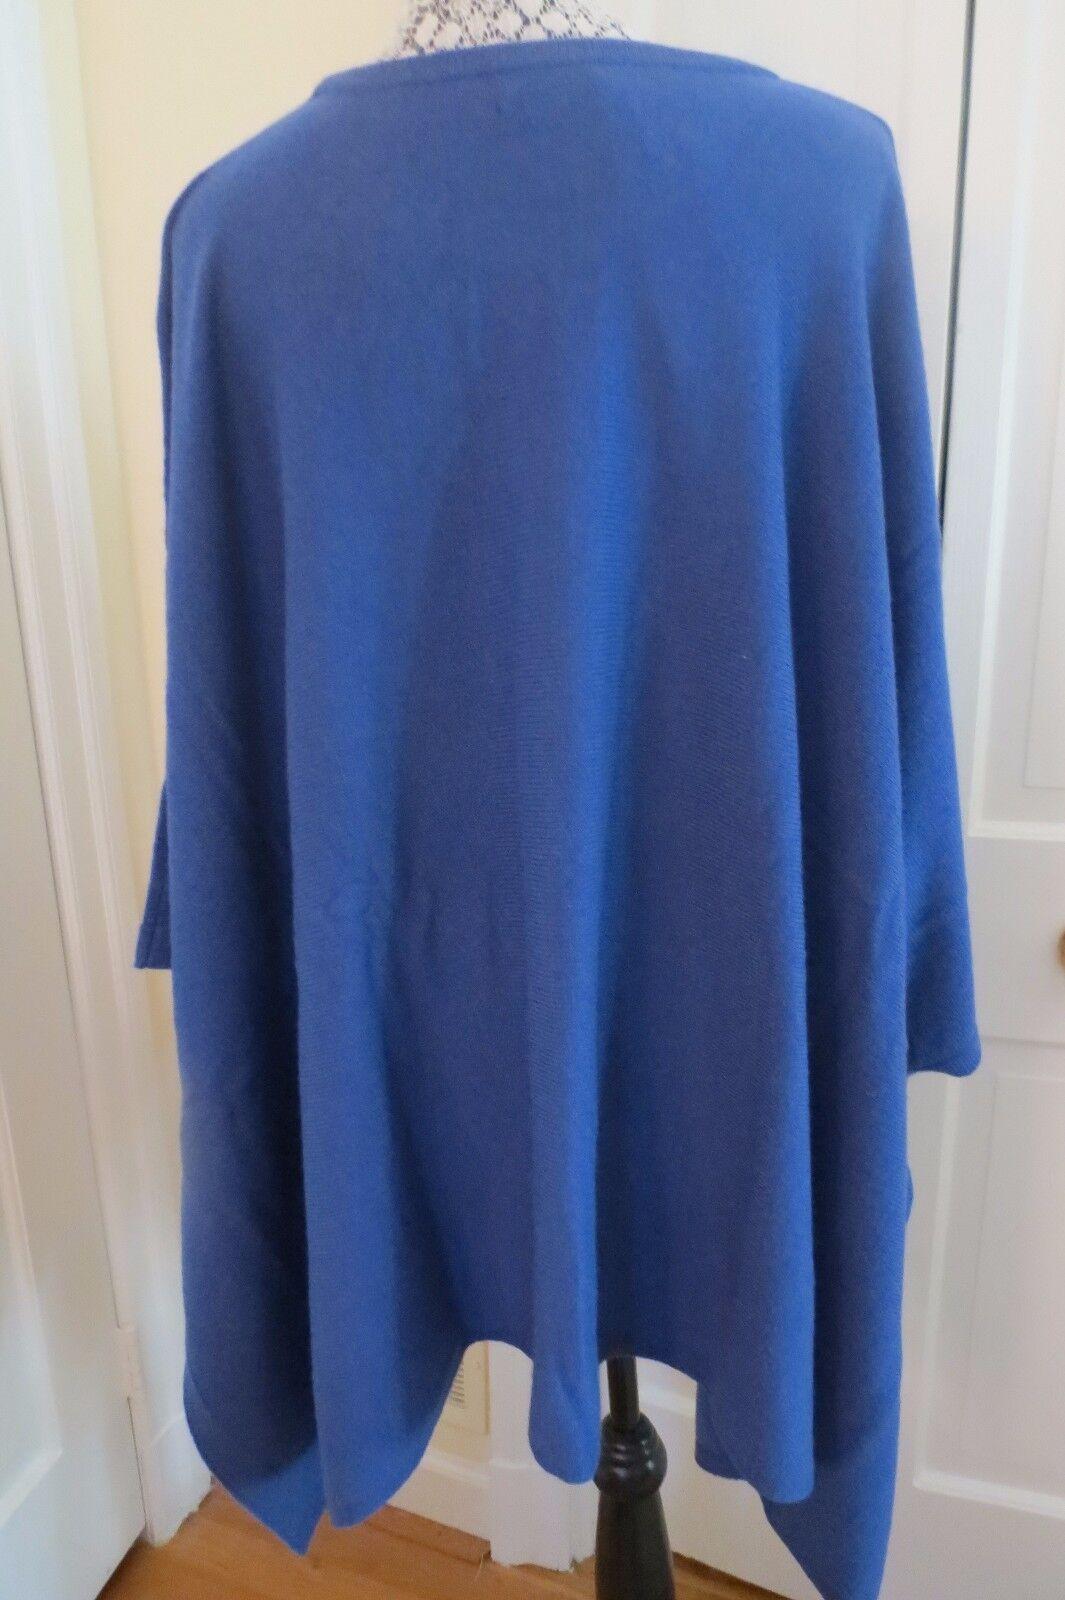 M.I.L.A. Gemma Gemma Gemma Cashmere Sweater Poncho - Sapphire bluee – NWT -  490 228b8e